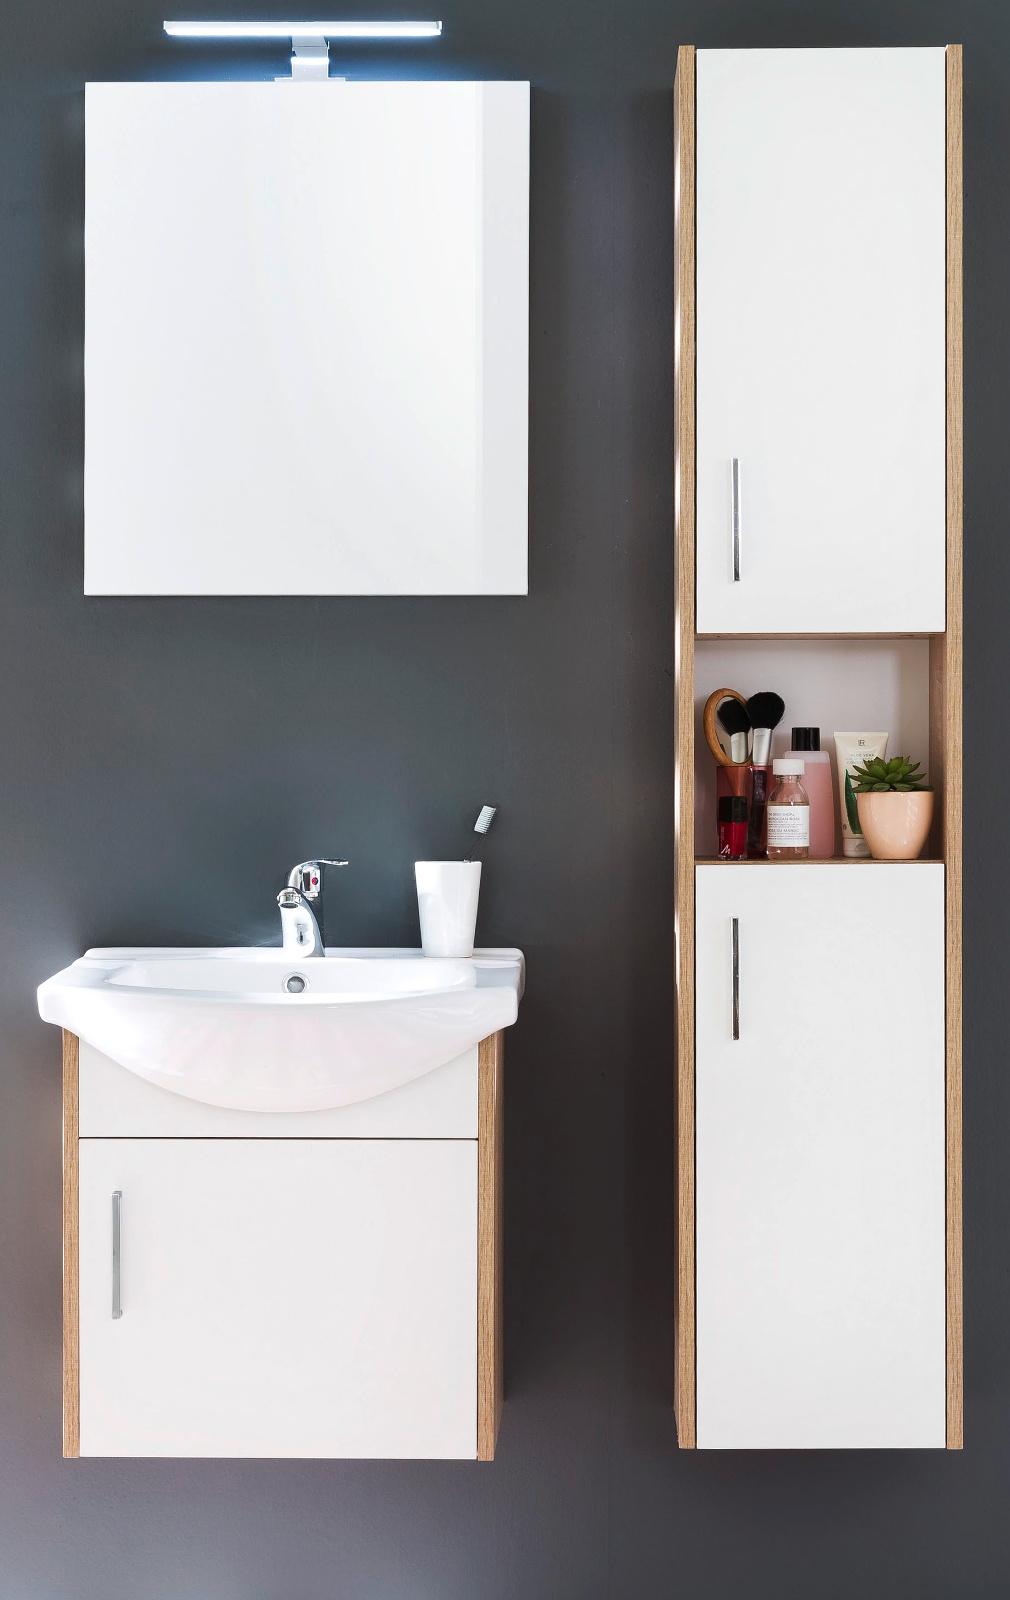 badspiegel jersey in eiche optional led ansatzleuchte. Black Bedroom Furniture Sets. Home Design Ideas